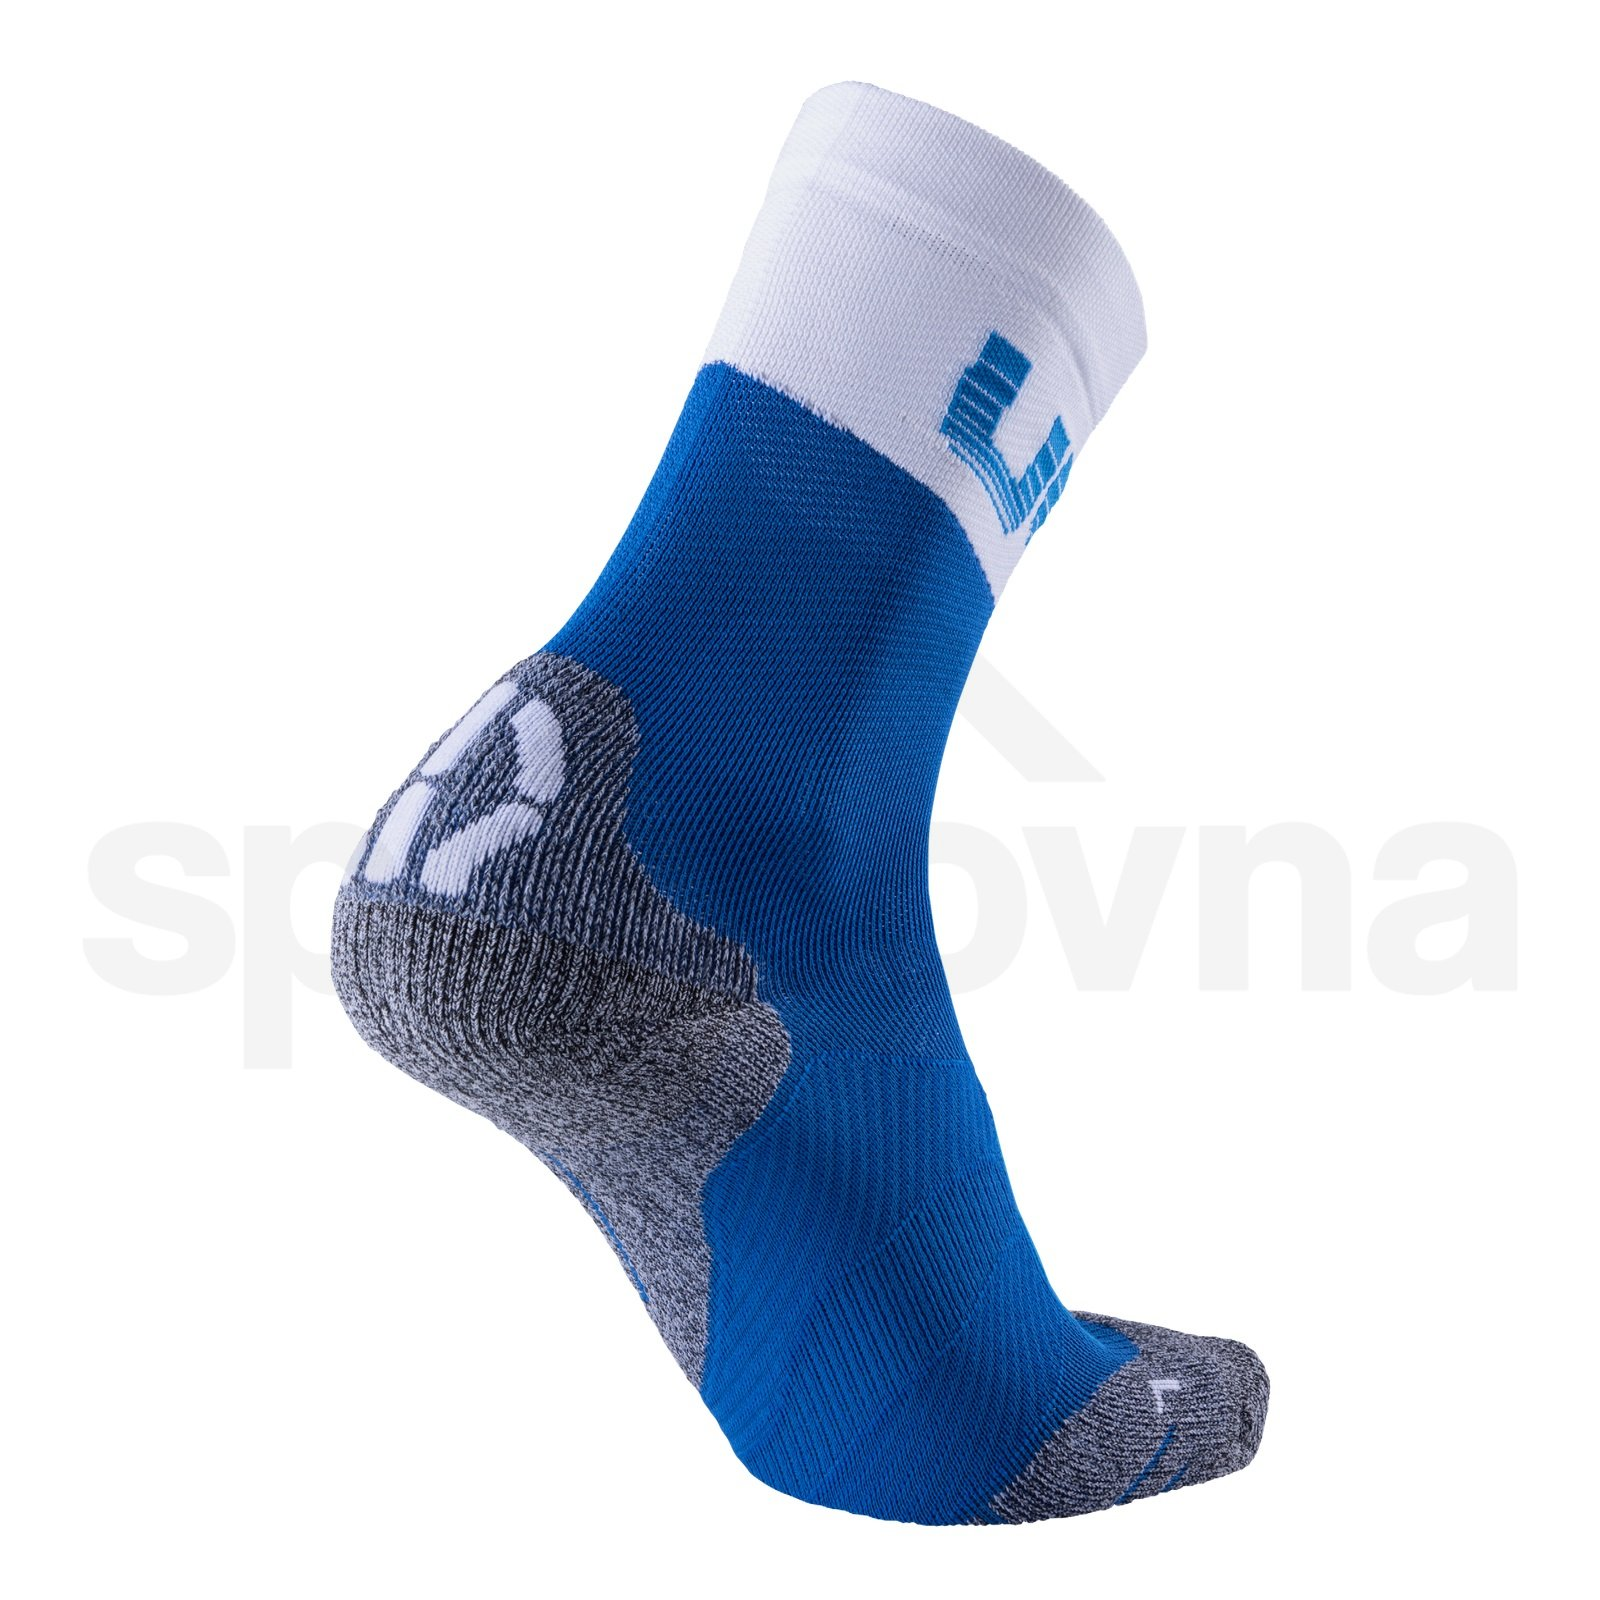 Ponožky UYN CYCLING LIGHT - modrá//bílá/šedá